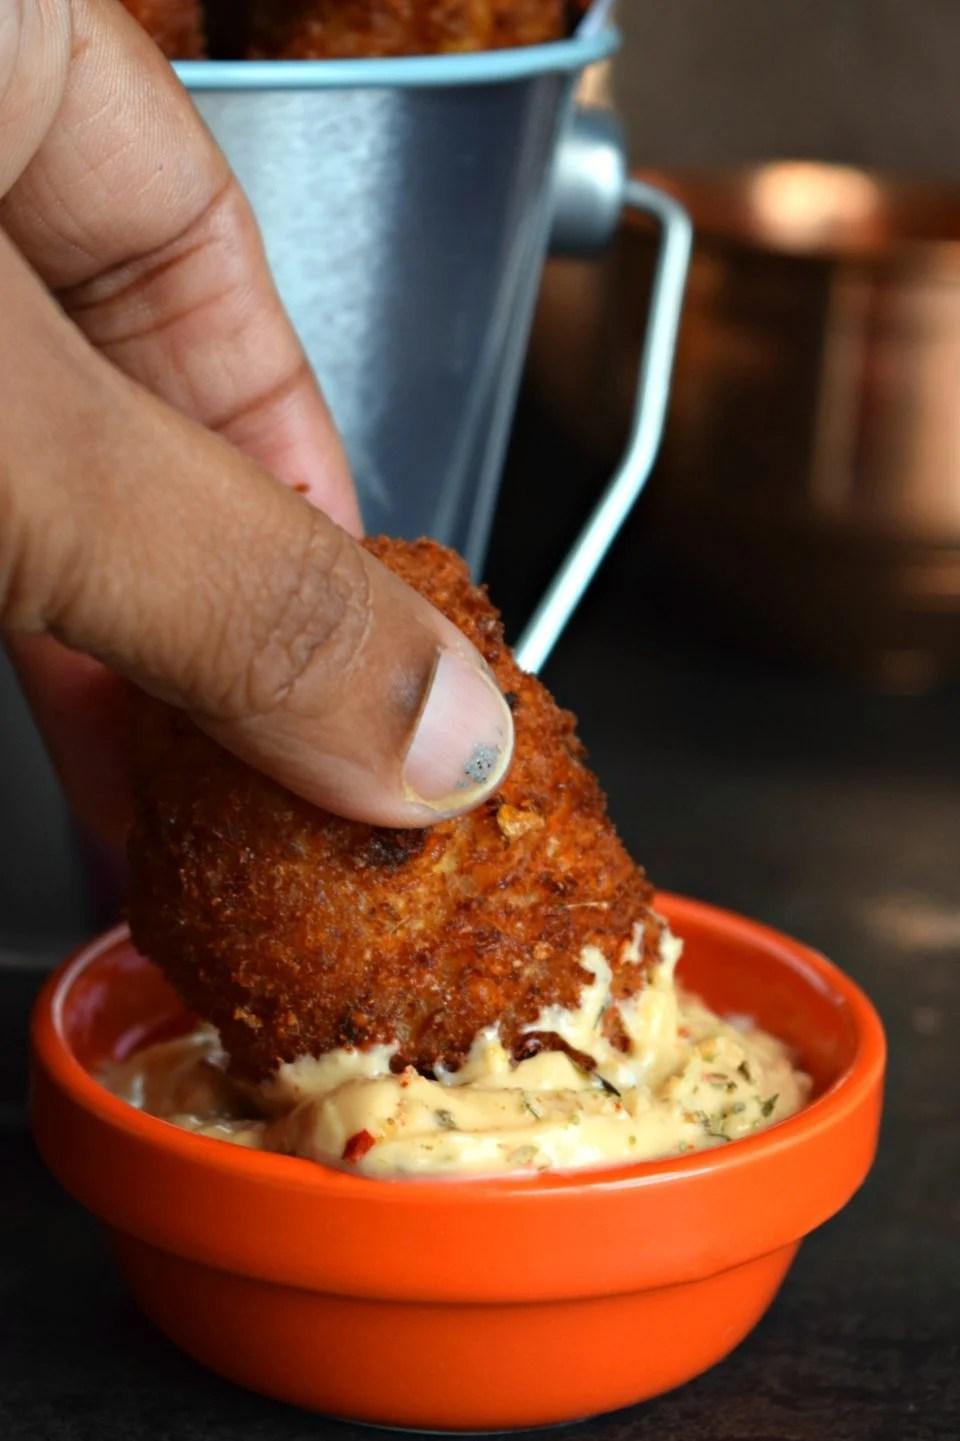 Stella Cheese, Rice & Methi Kebab With Tater Tot StuffingAppetizers & Snacks